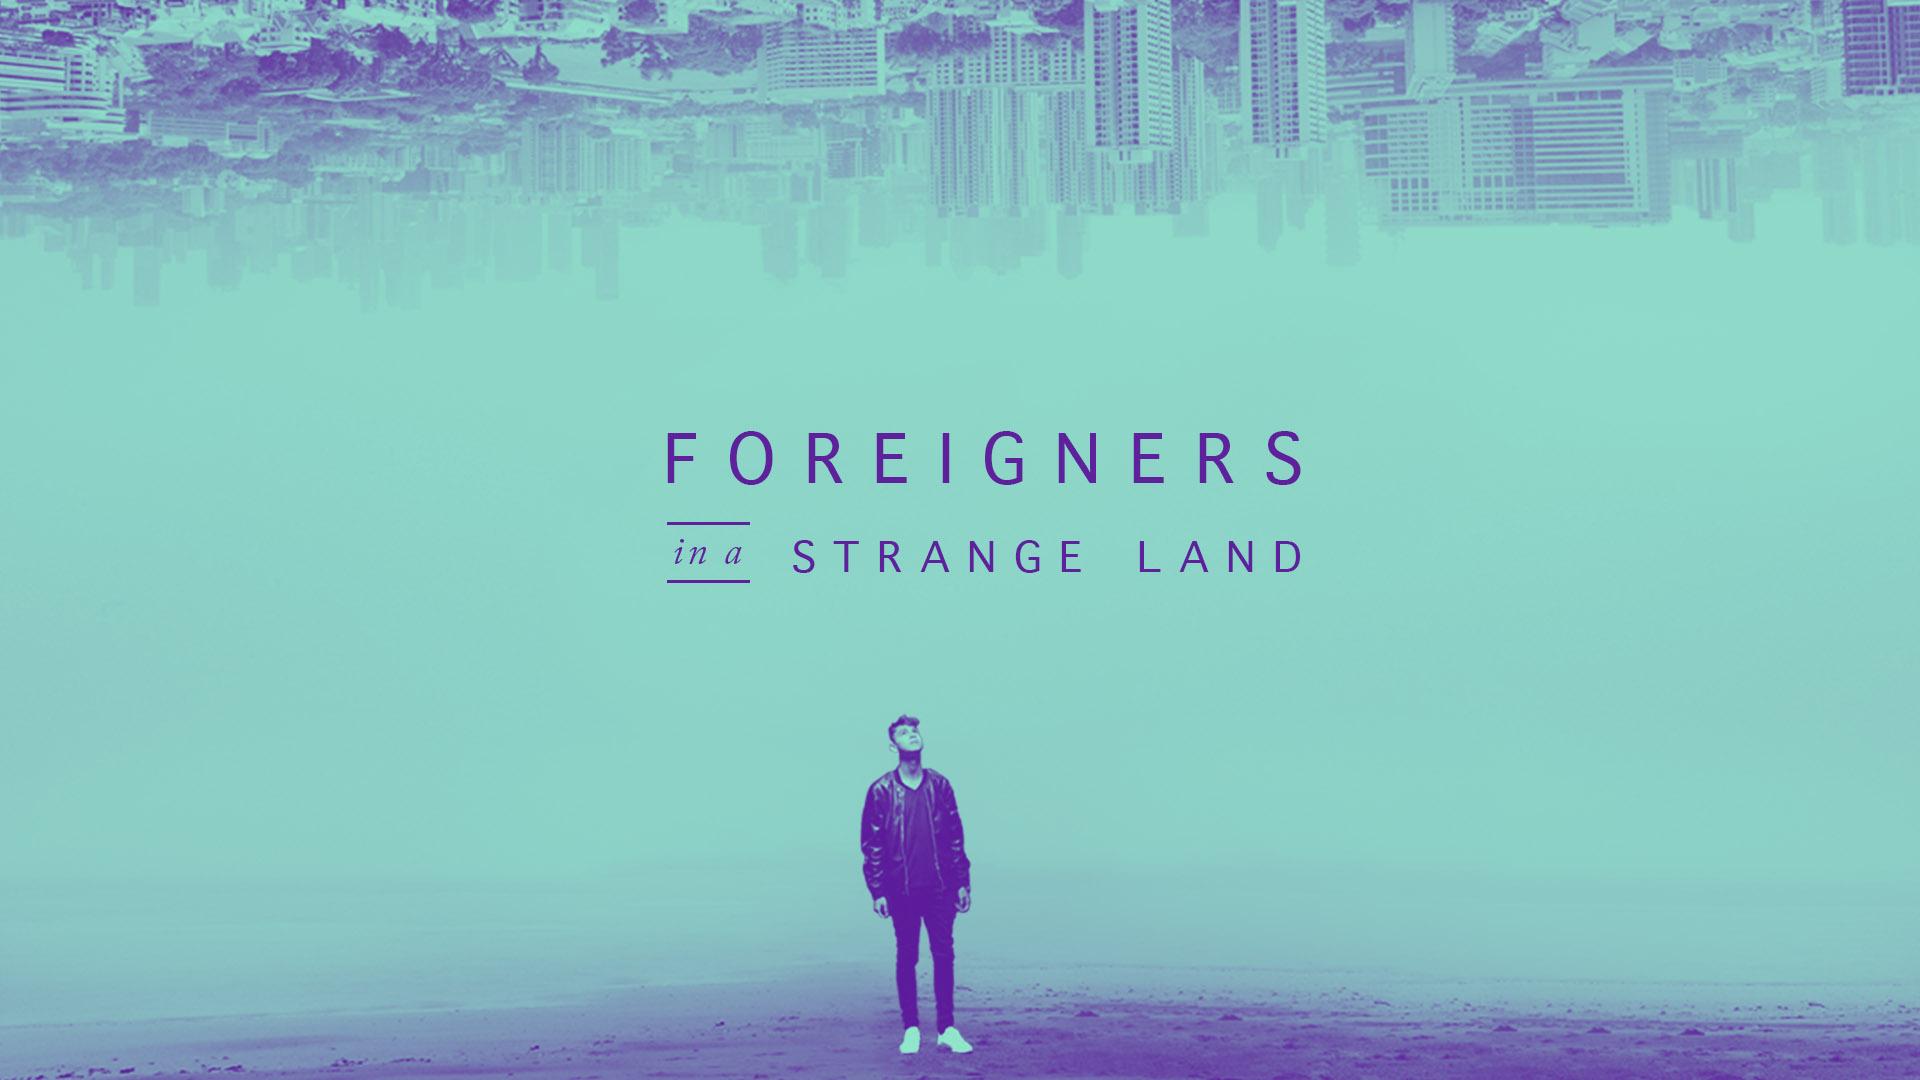 st-johns-harborne-sermon-series-foreigners-in-a-strange-land.jpg